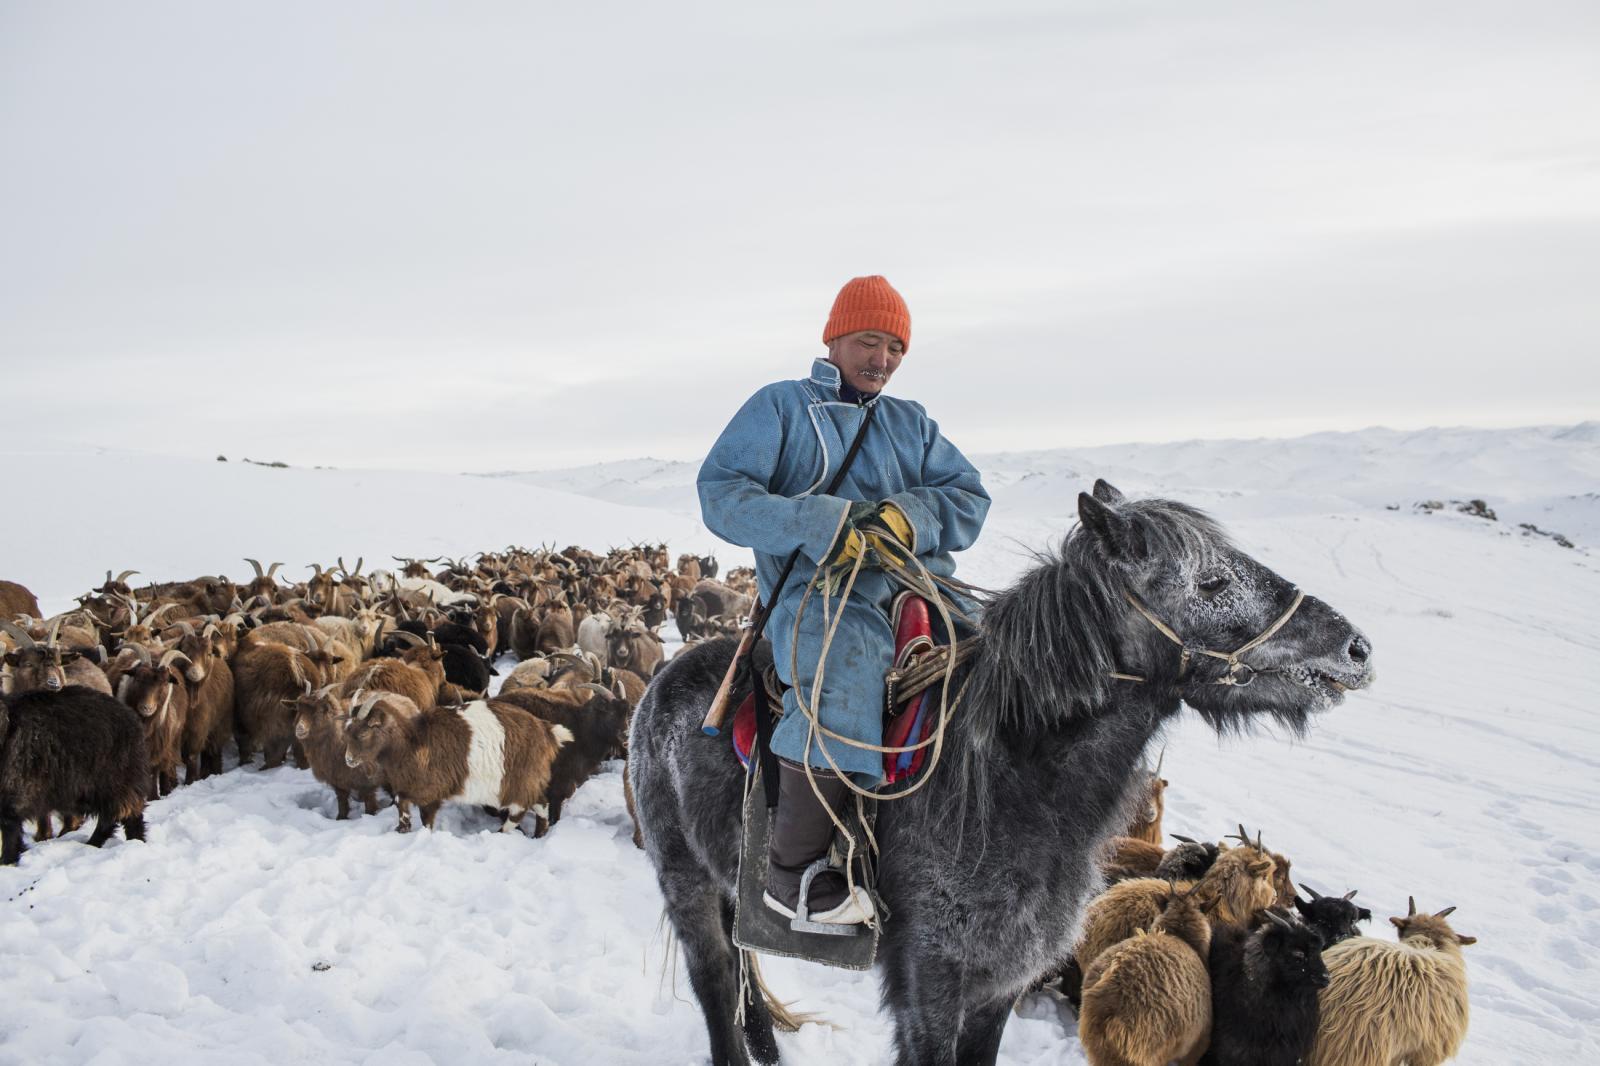 Photography image - Loading Mongolia_For_Website-002.JPG